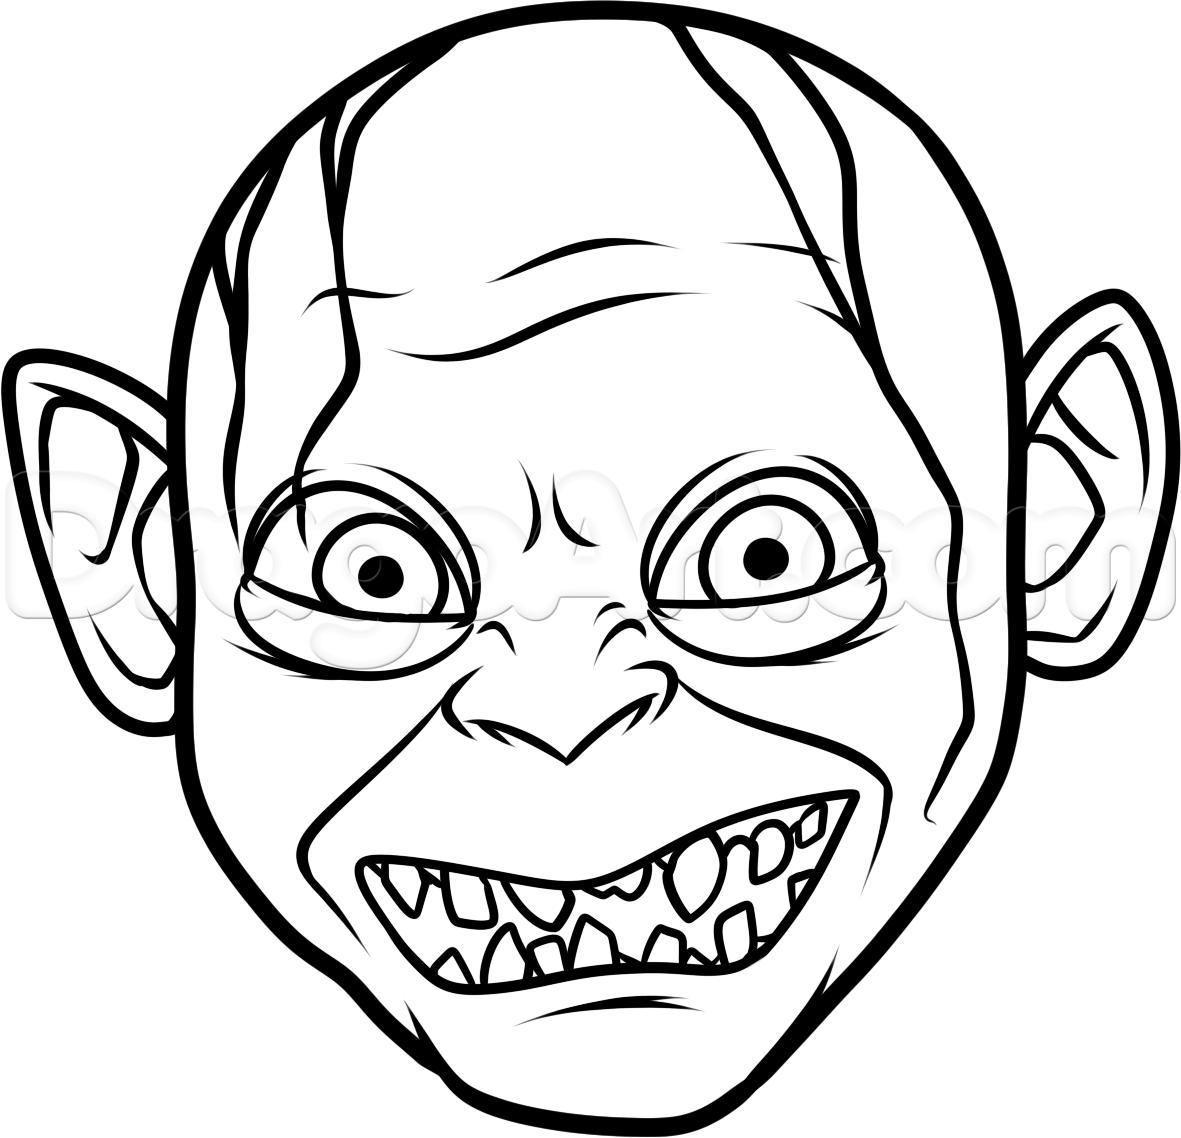 Gollum svg #13, Download drawings